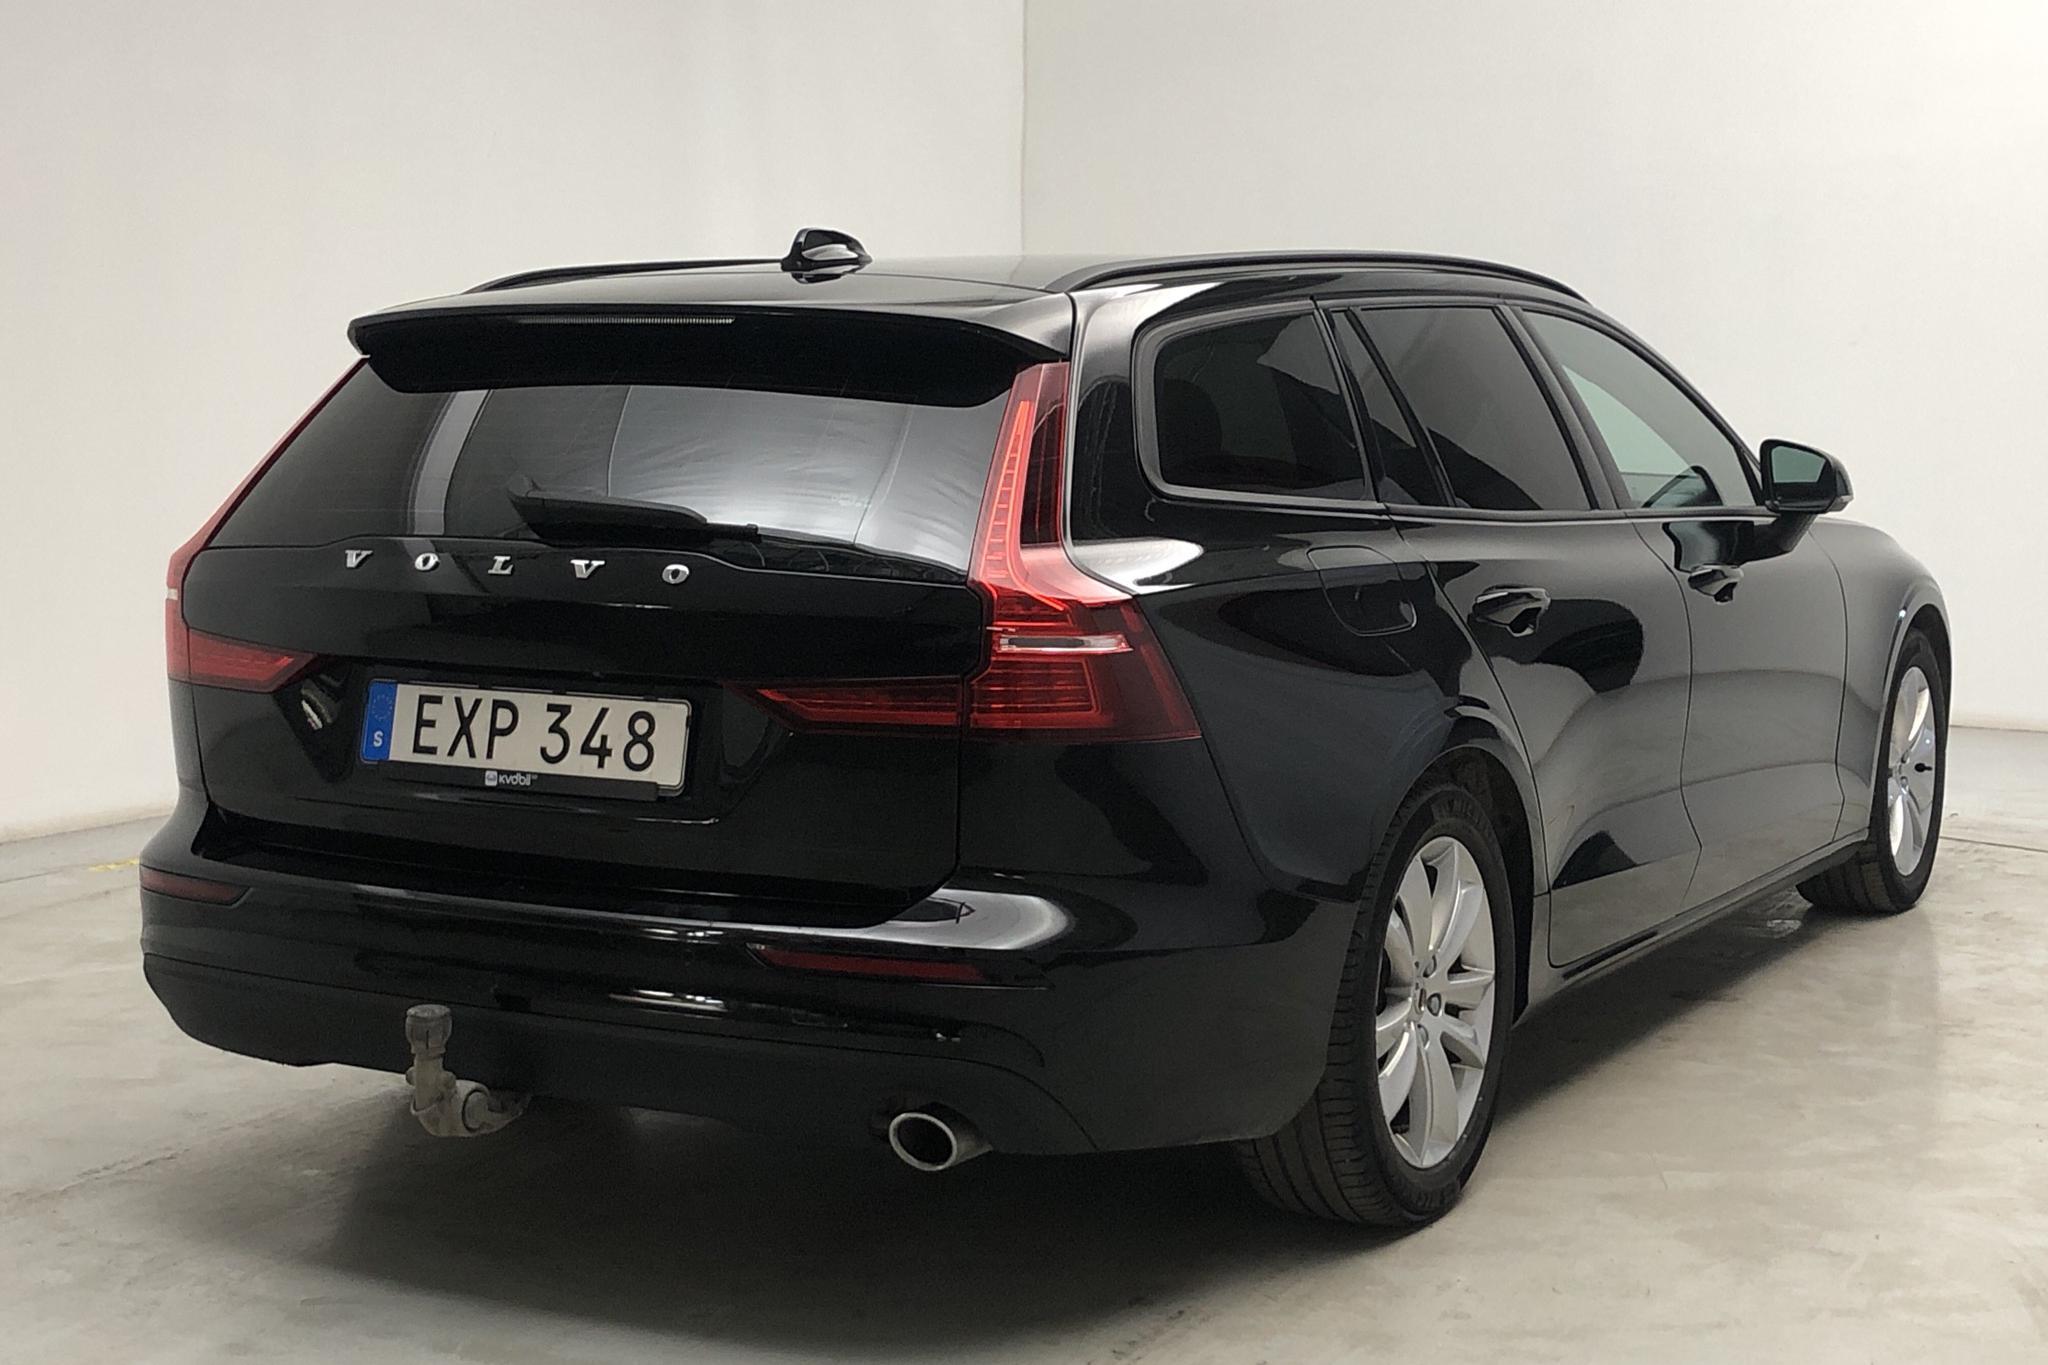 Volvo V60 D3 (150hk) - 90 860 km - Automatic - black - 2019